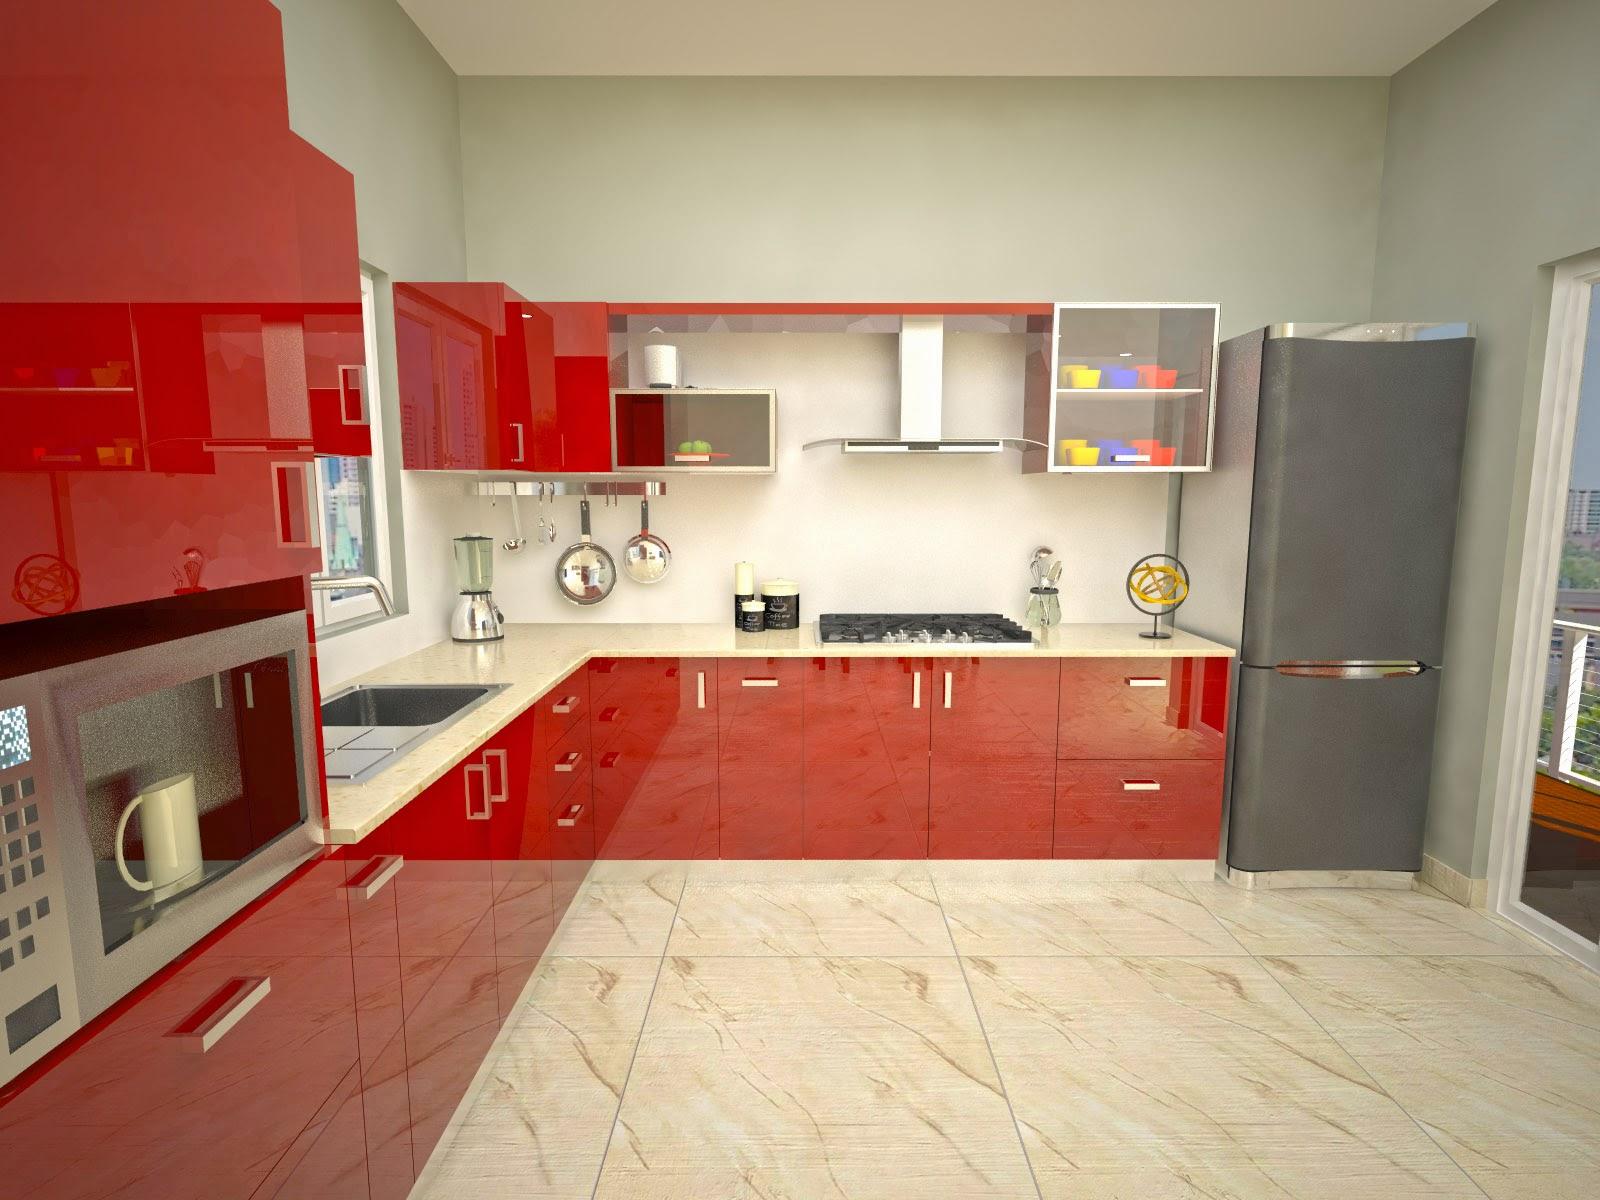 Aamoda kitchen u shaped l shaped modular kitchen design - L shaped indian modular kitchen designs ...